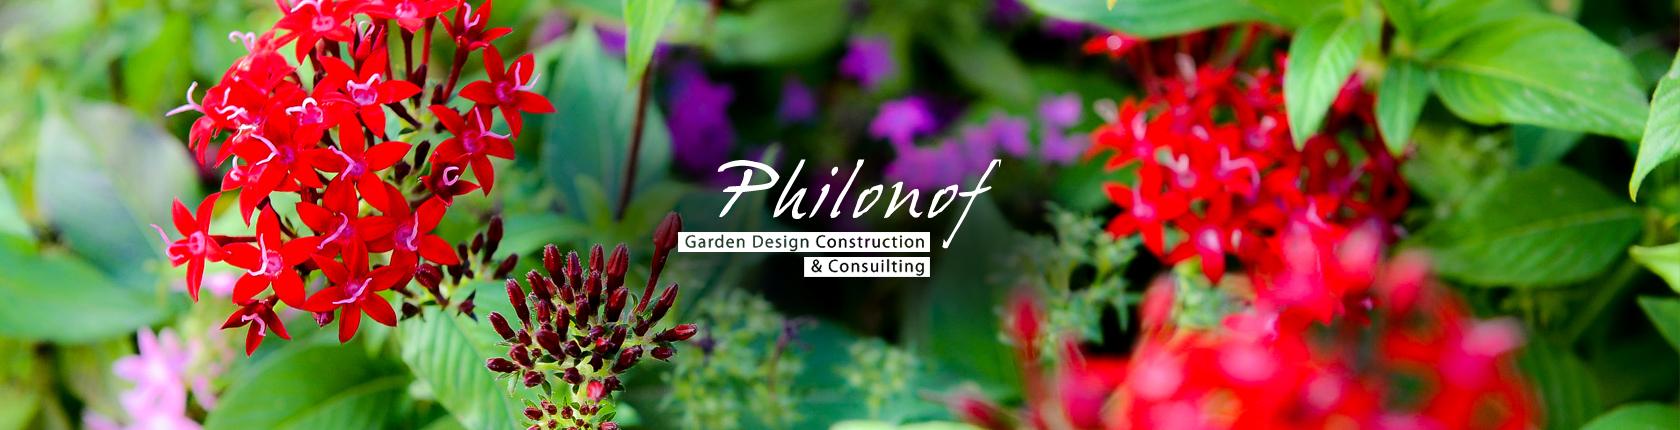 Philonof